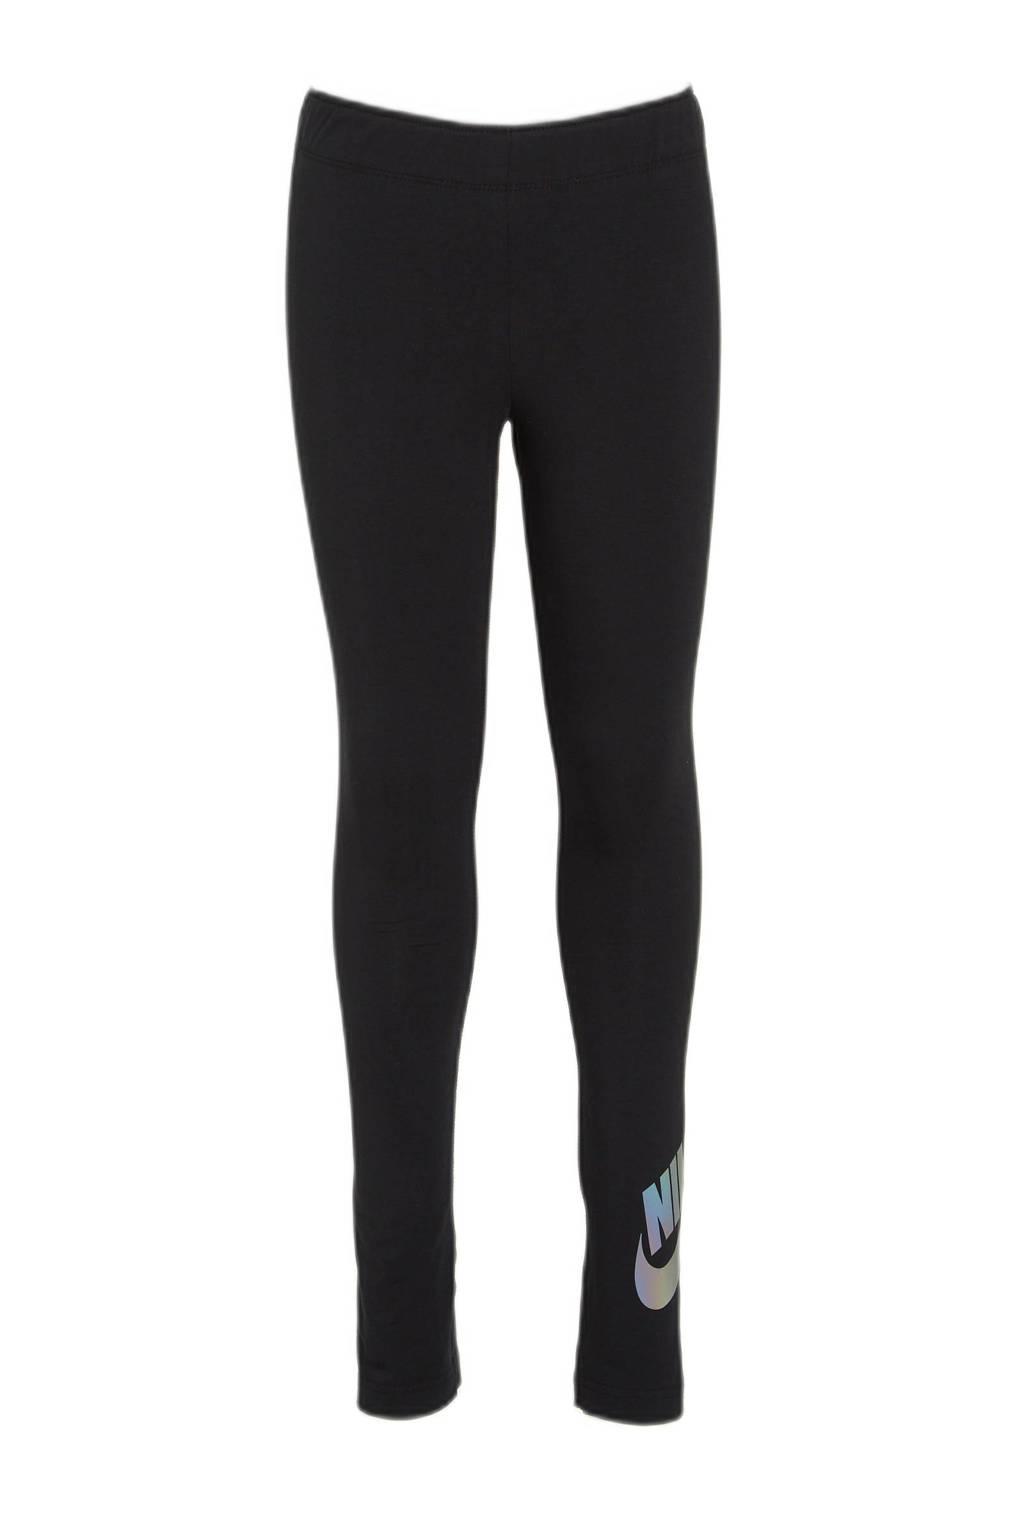 Nike legging zwart/grijs, Zwart/grijs